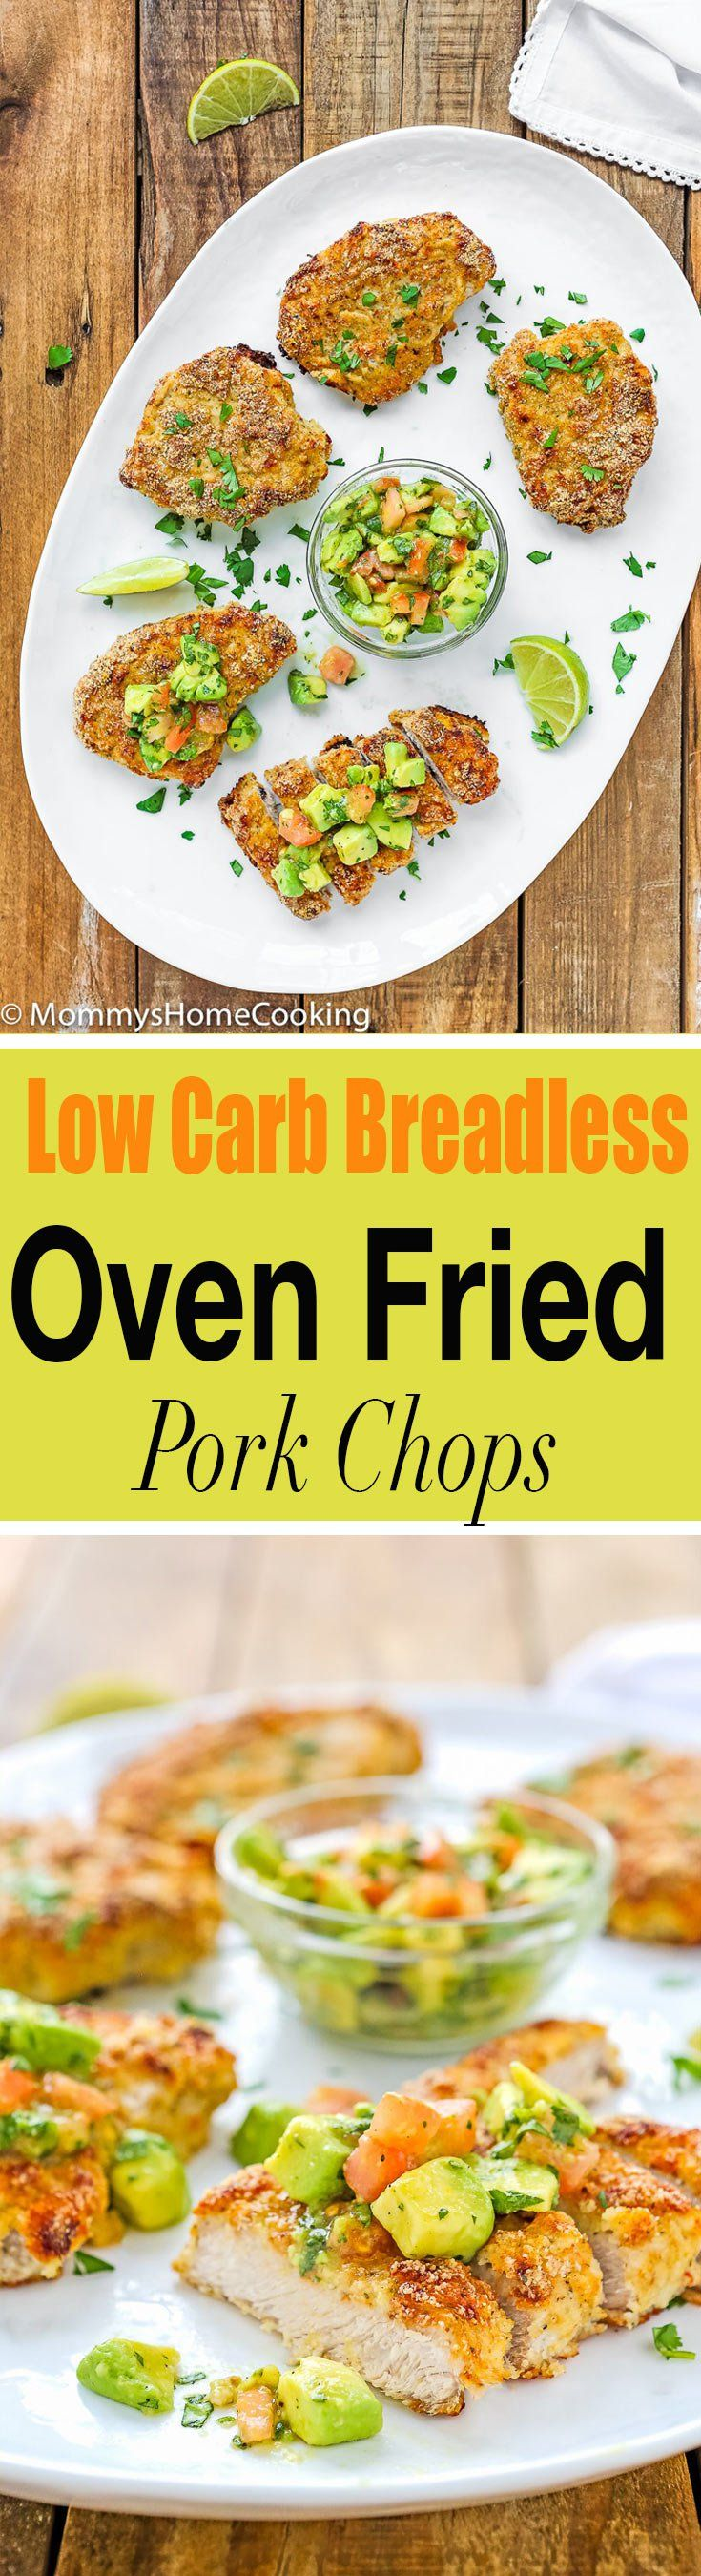 Skinny Oven Fried Pork Chops